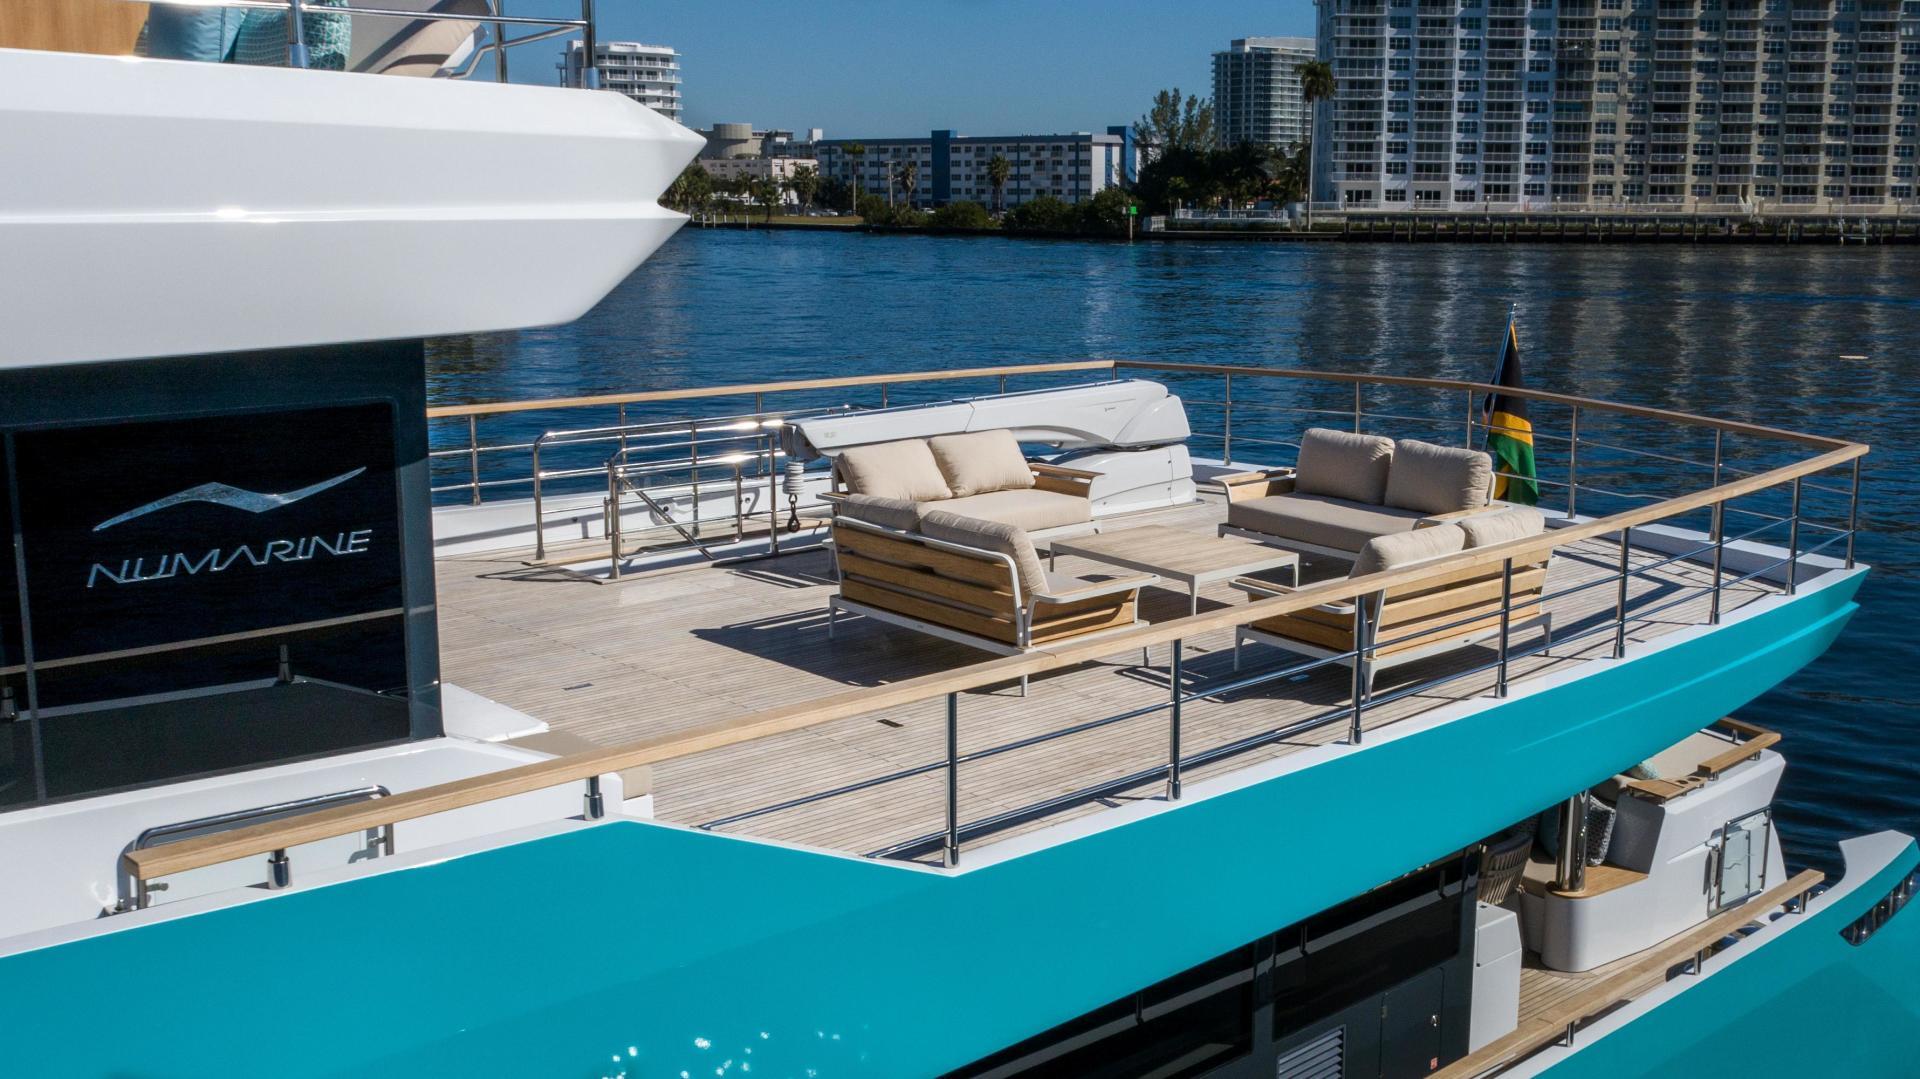 Numarine-32XP 2020-7 Diamonds Fort Lauderdale-Florida-United States-1629336 | Thumbnail